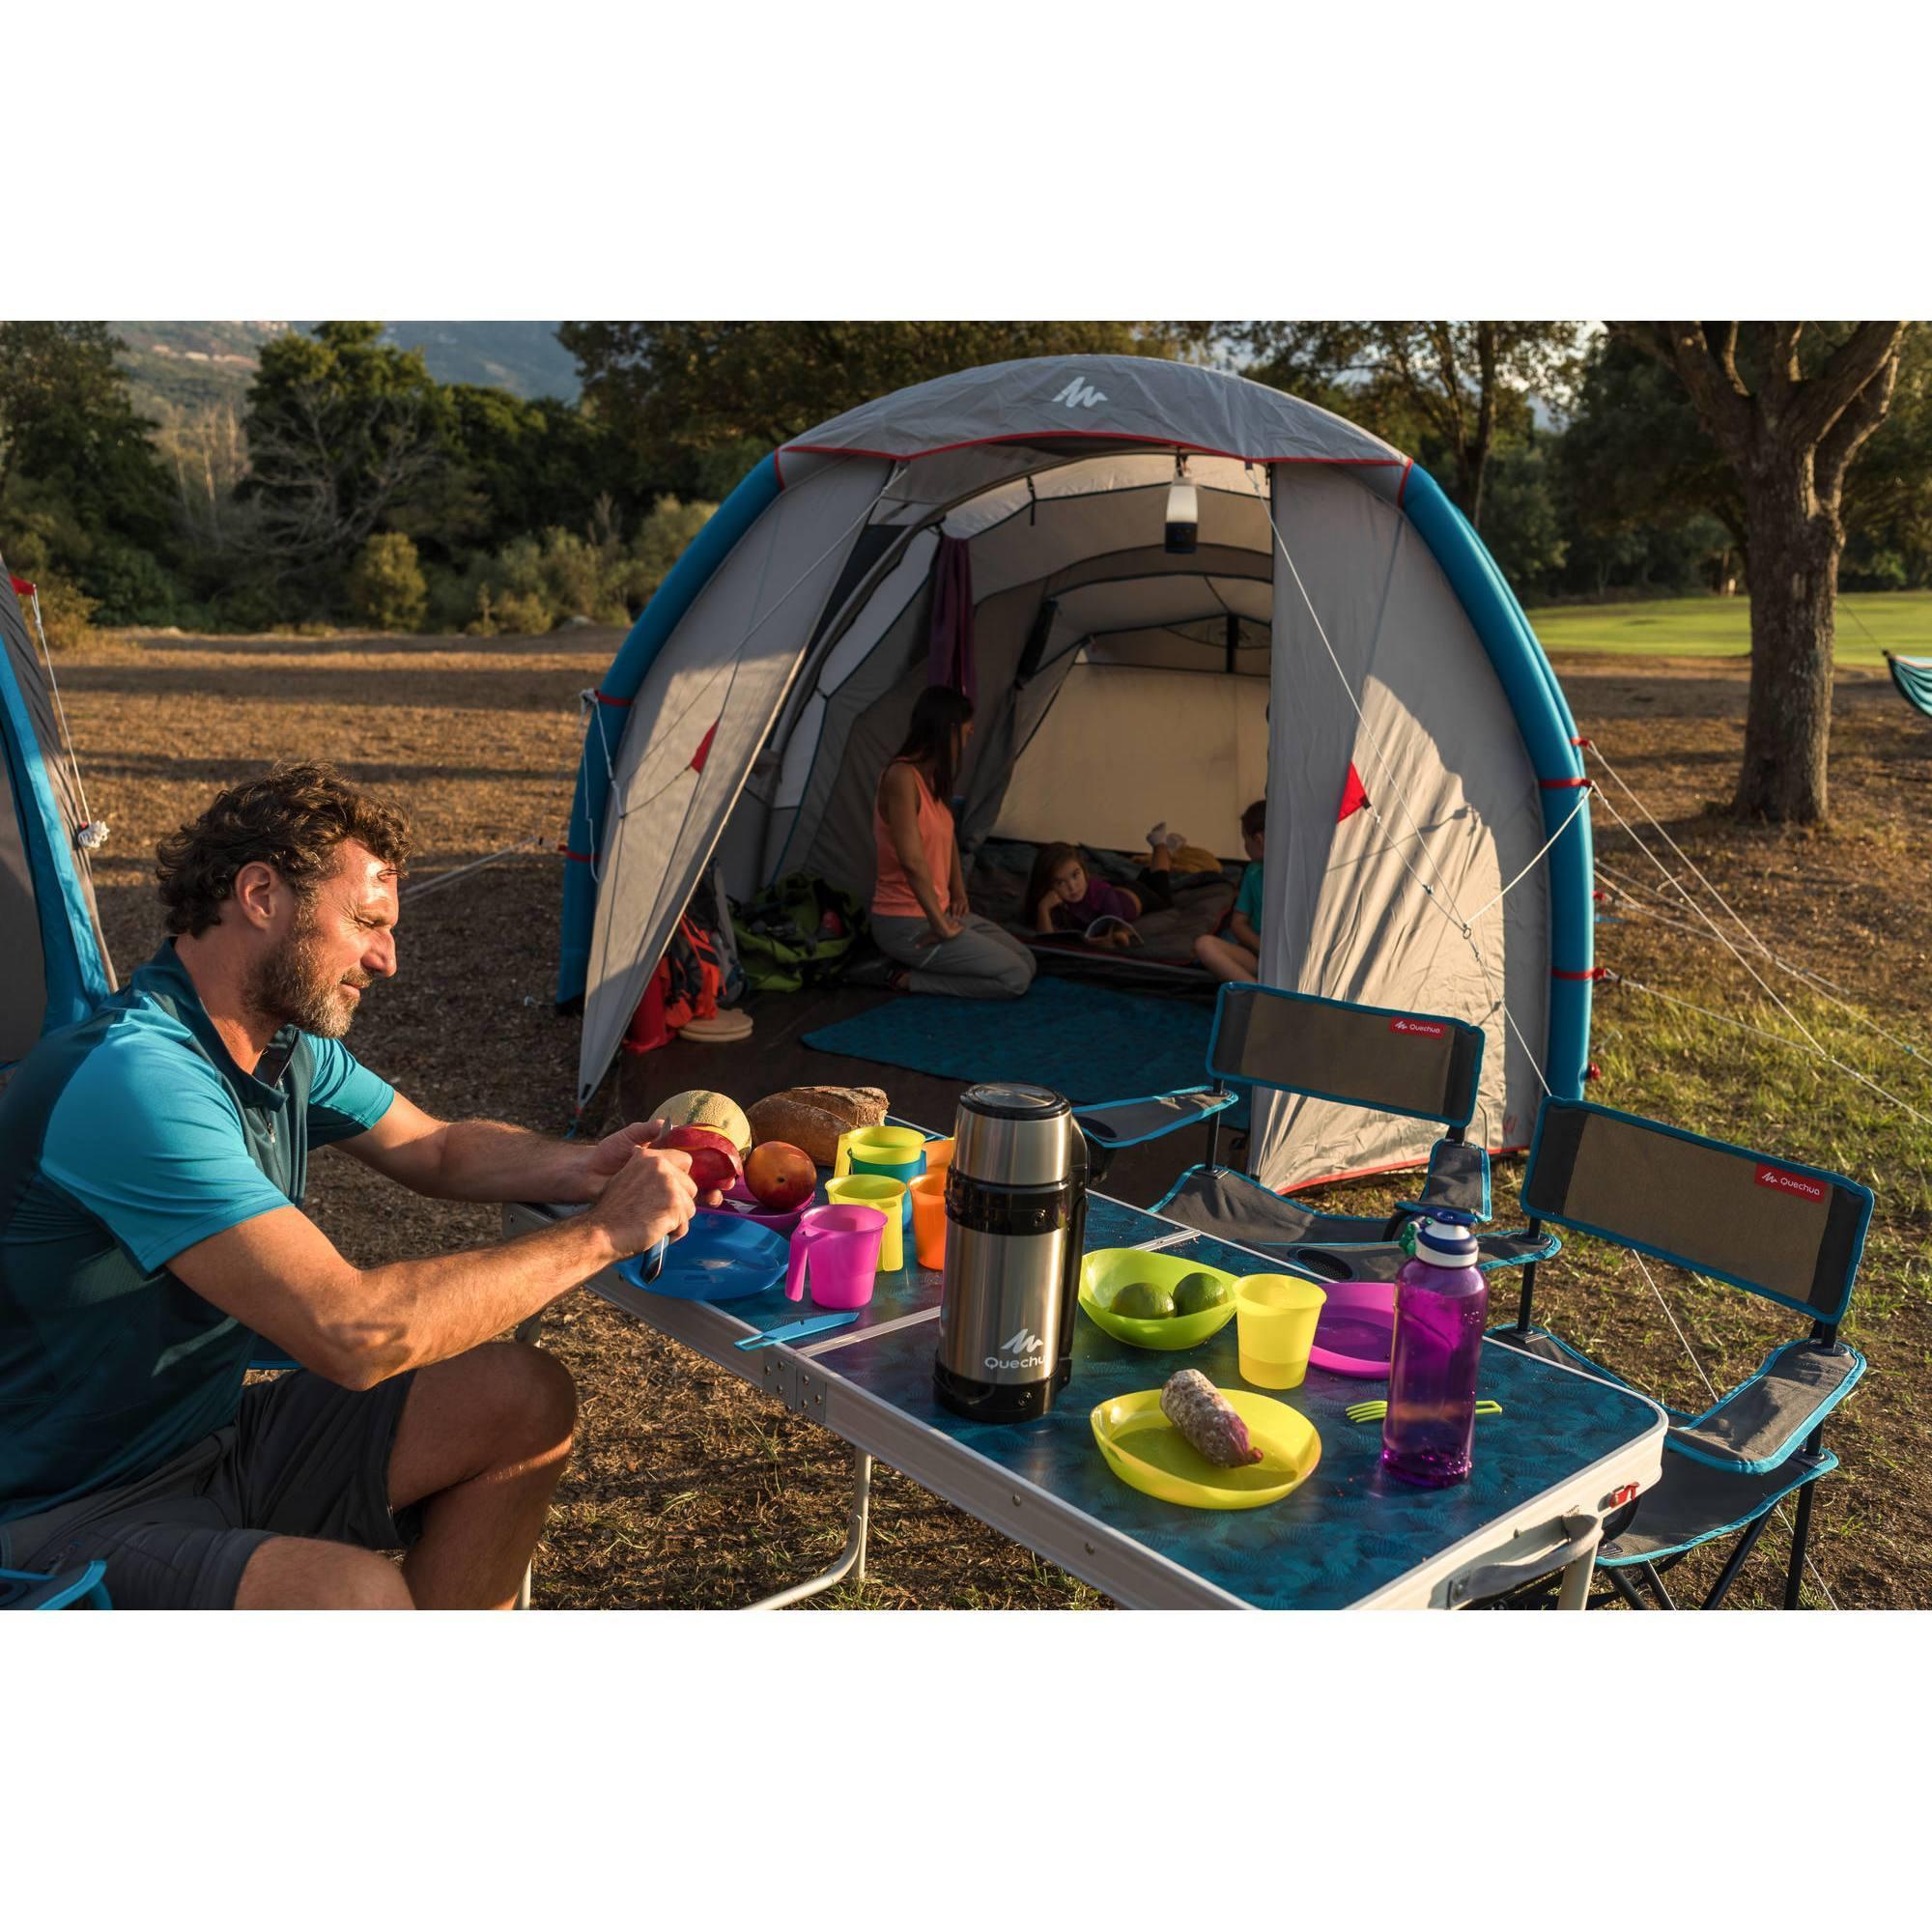 table de camping 4 personnes avec 4 si ges clubs collectivit s decathlon pro. Black Bedroom Furniture Sets. Home Design Ideas